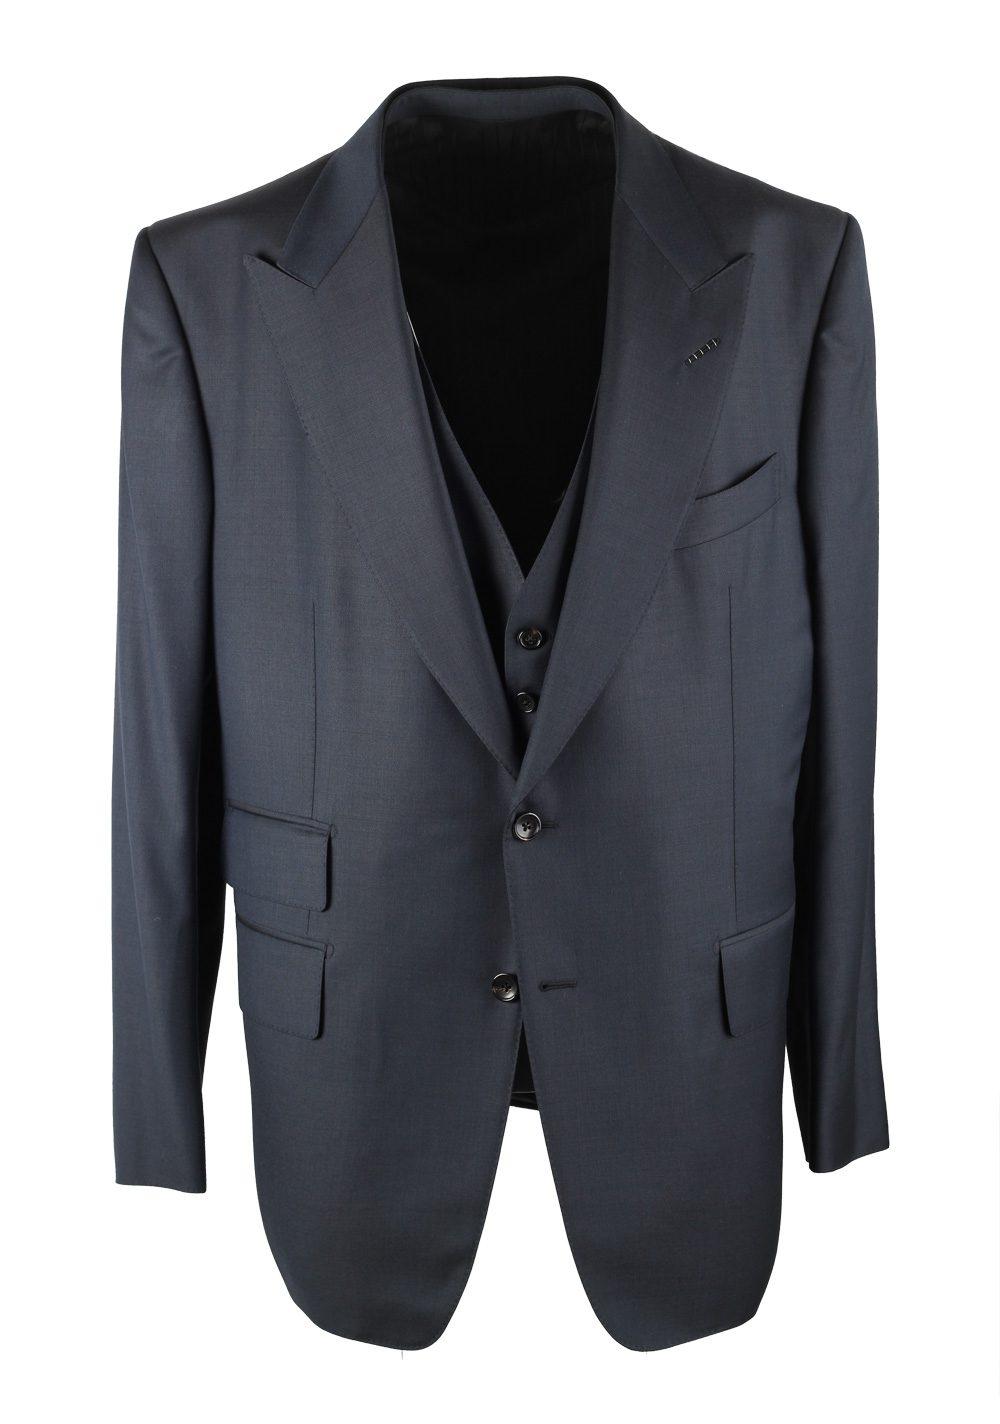 TOM FORD Windsor Blue 3 Piece Suit Size 58 / 48R U.S. Wool Fit A | Costume Limité